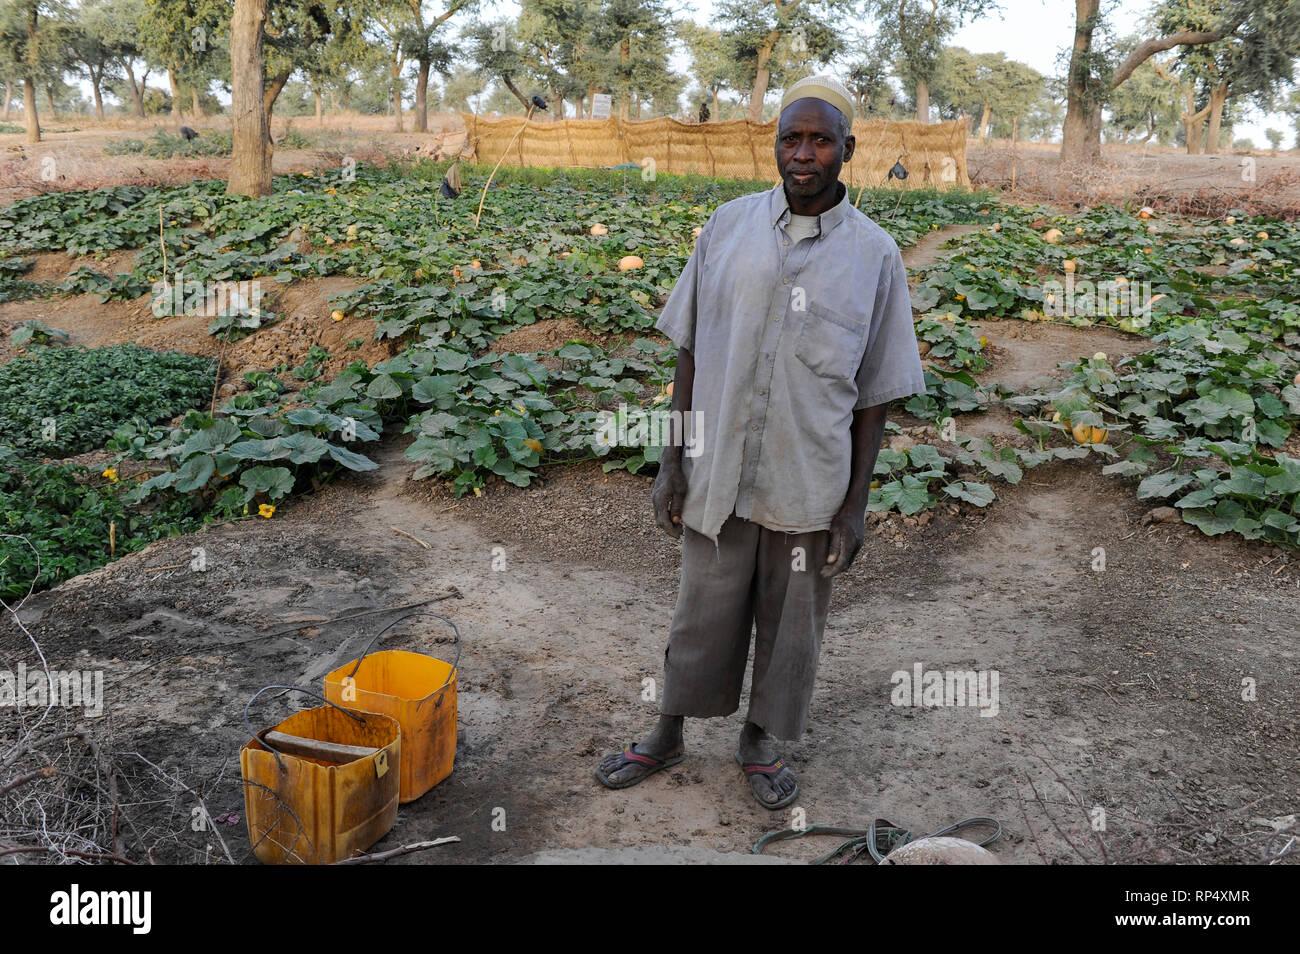 NIGER, Sahel, Zinder, village Baban Tapki, food security project by Caritas, vegetable garden  /NIGER Zinder, Projekte Ernaehrungssicherung im Dorf Baban Tapki, Gemuesegarten - Stock Image